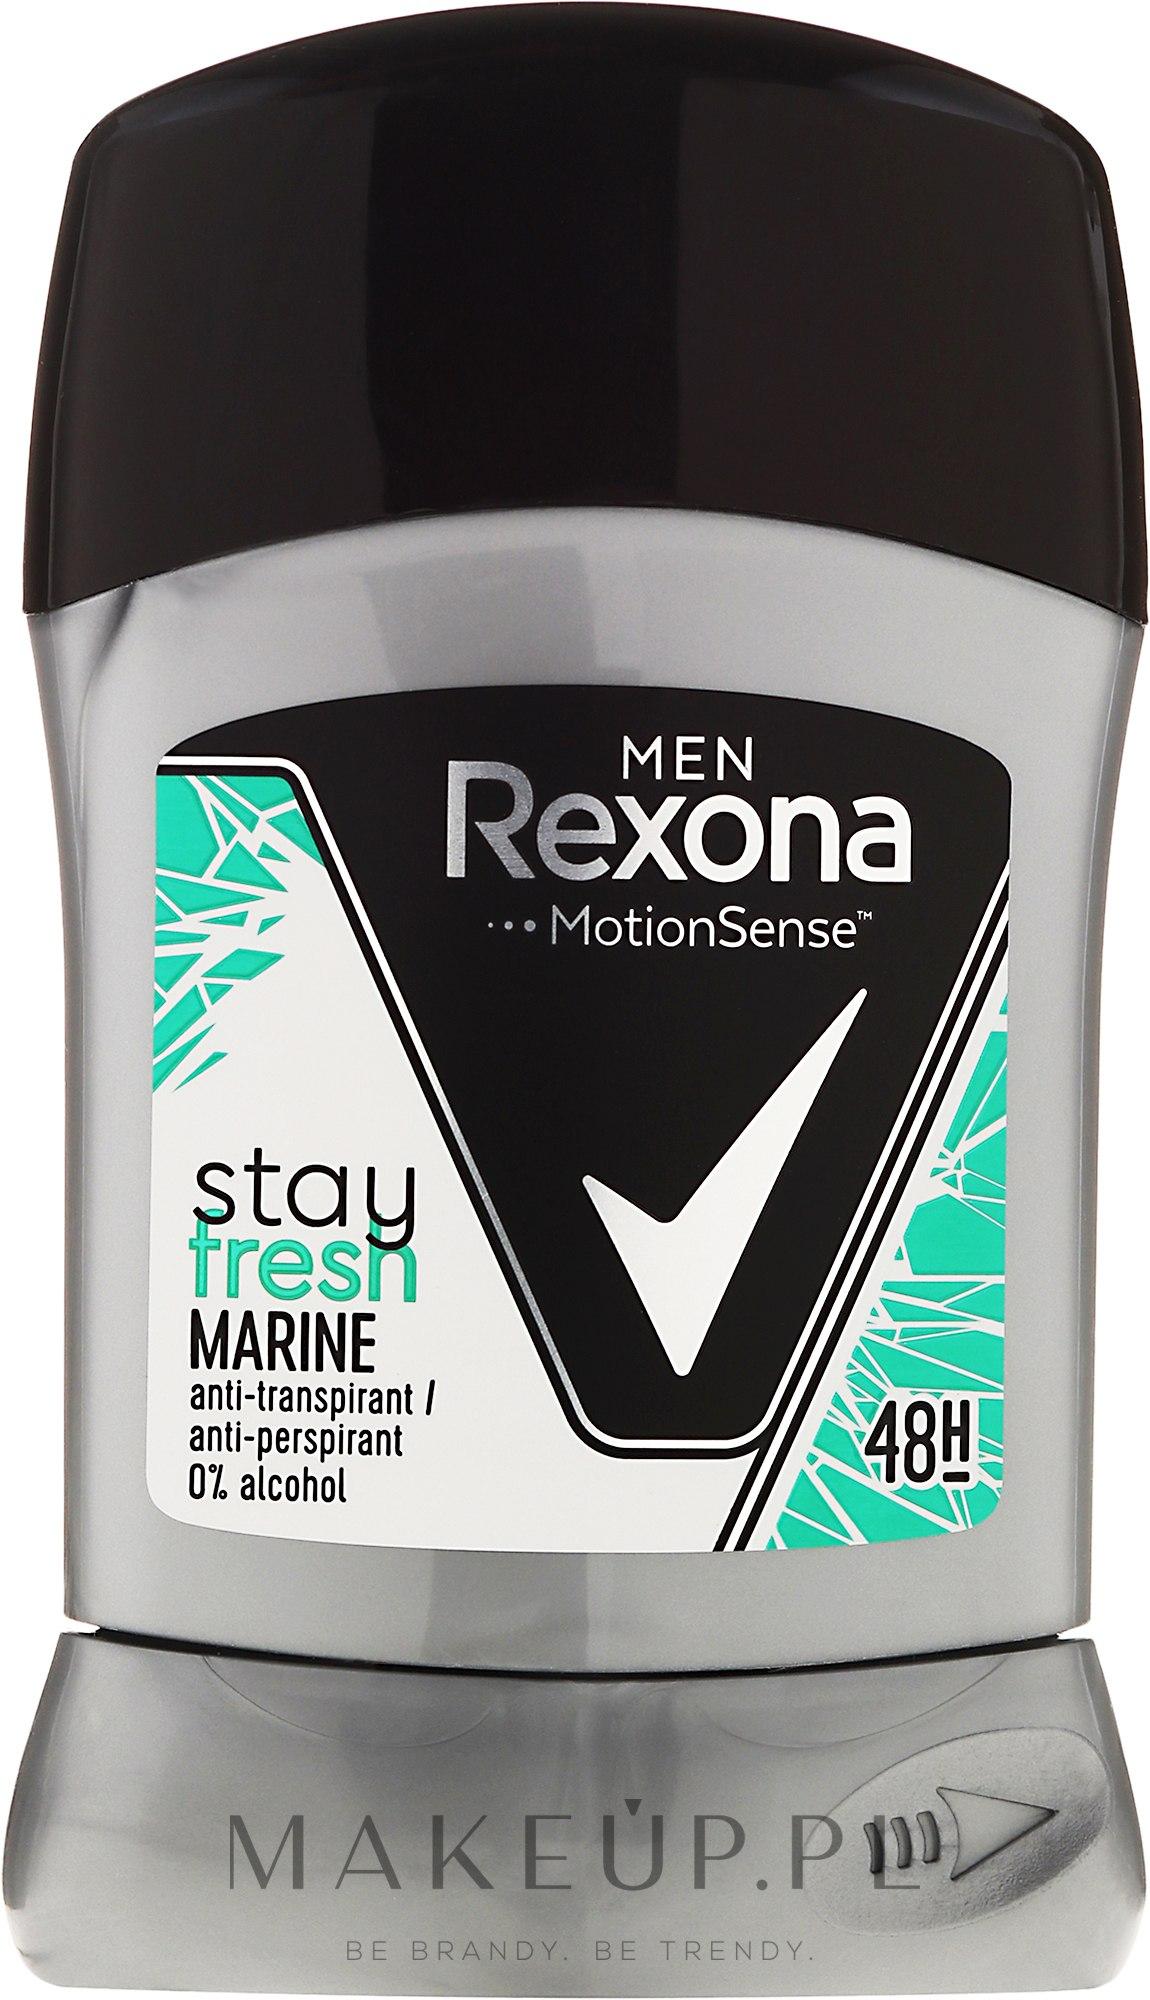 Antyperspirant w sztyfcie - Rexona Men MotionSense Stay Fresh Marine Deodorant Stick — фото 50 ml